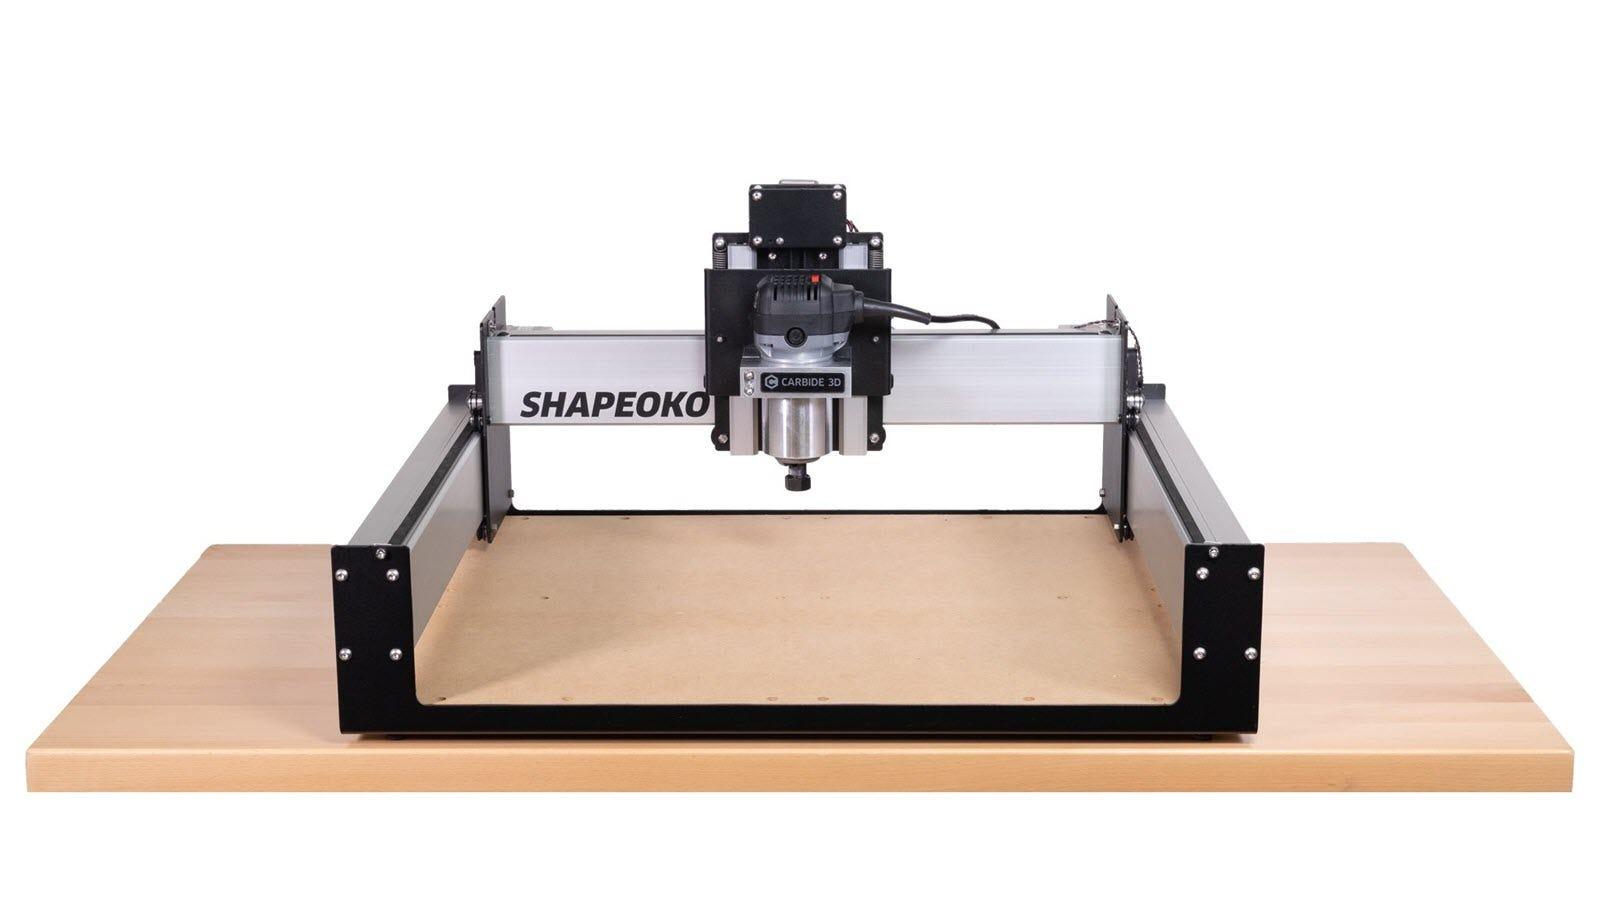 The Shapeoko 3 CNC machine sitting on a large wooden platform.